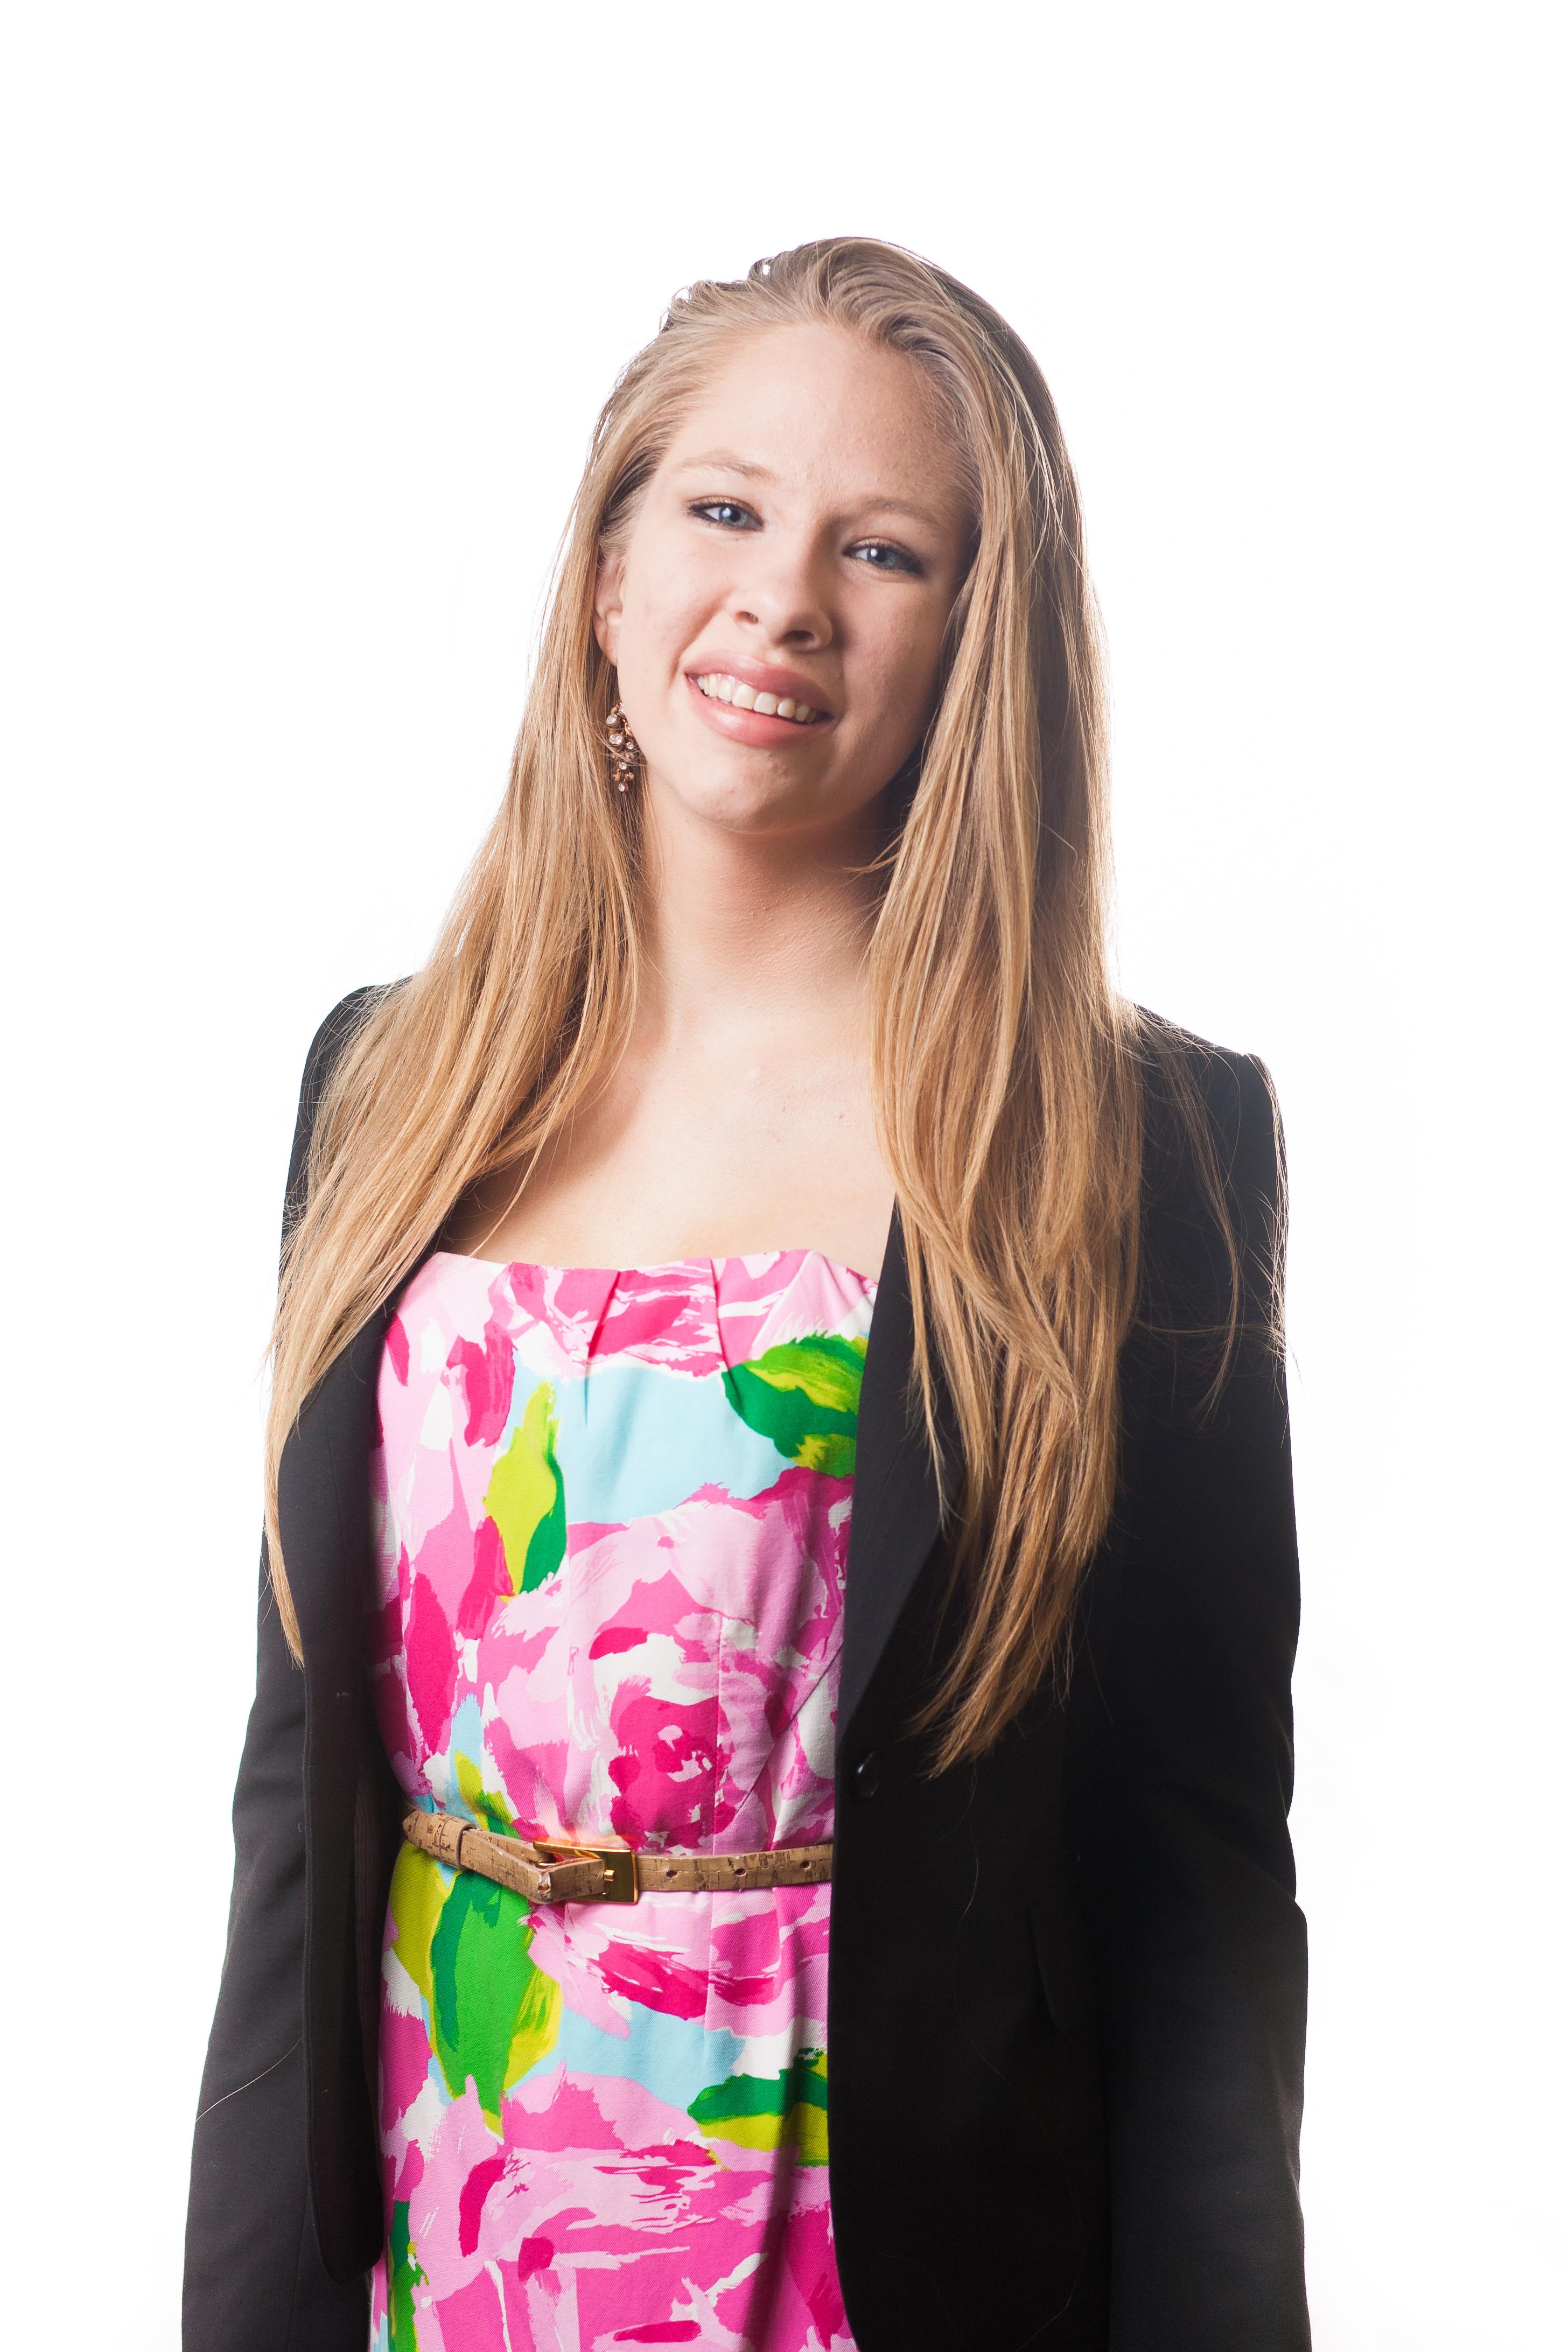 Caroline Nickerson